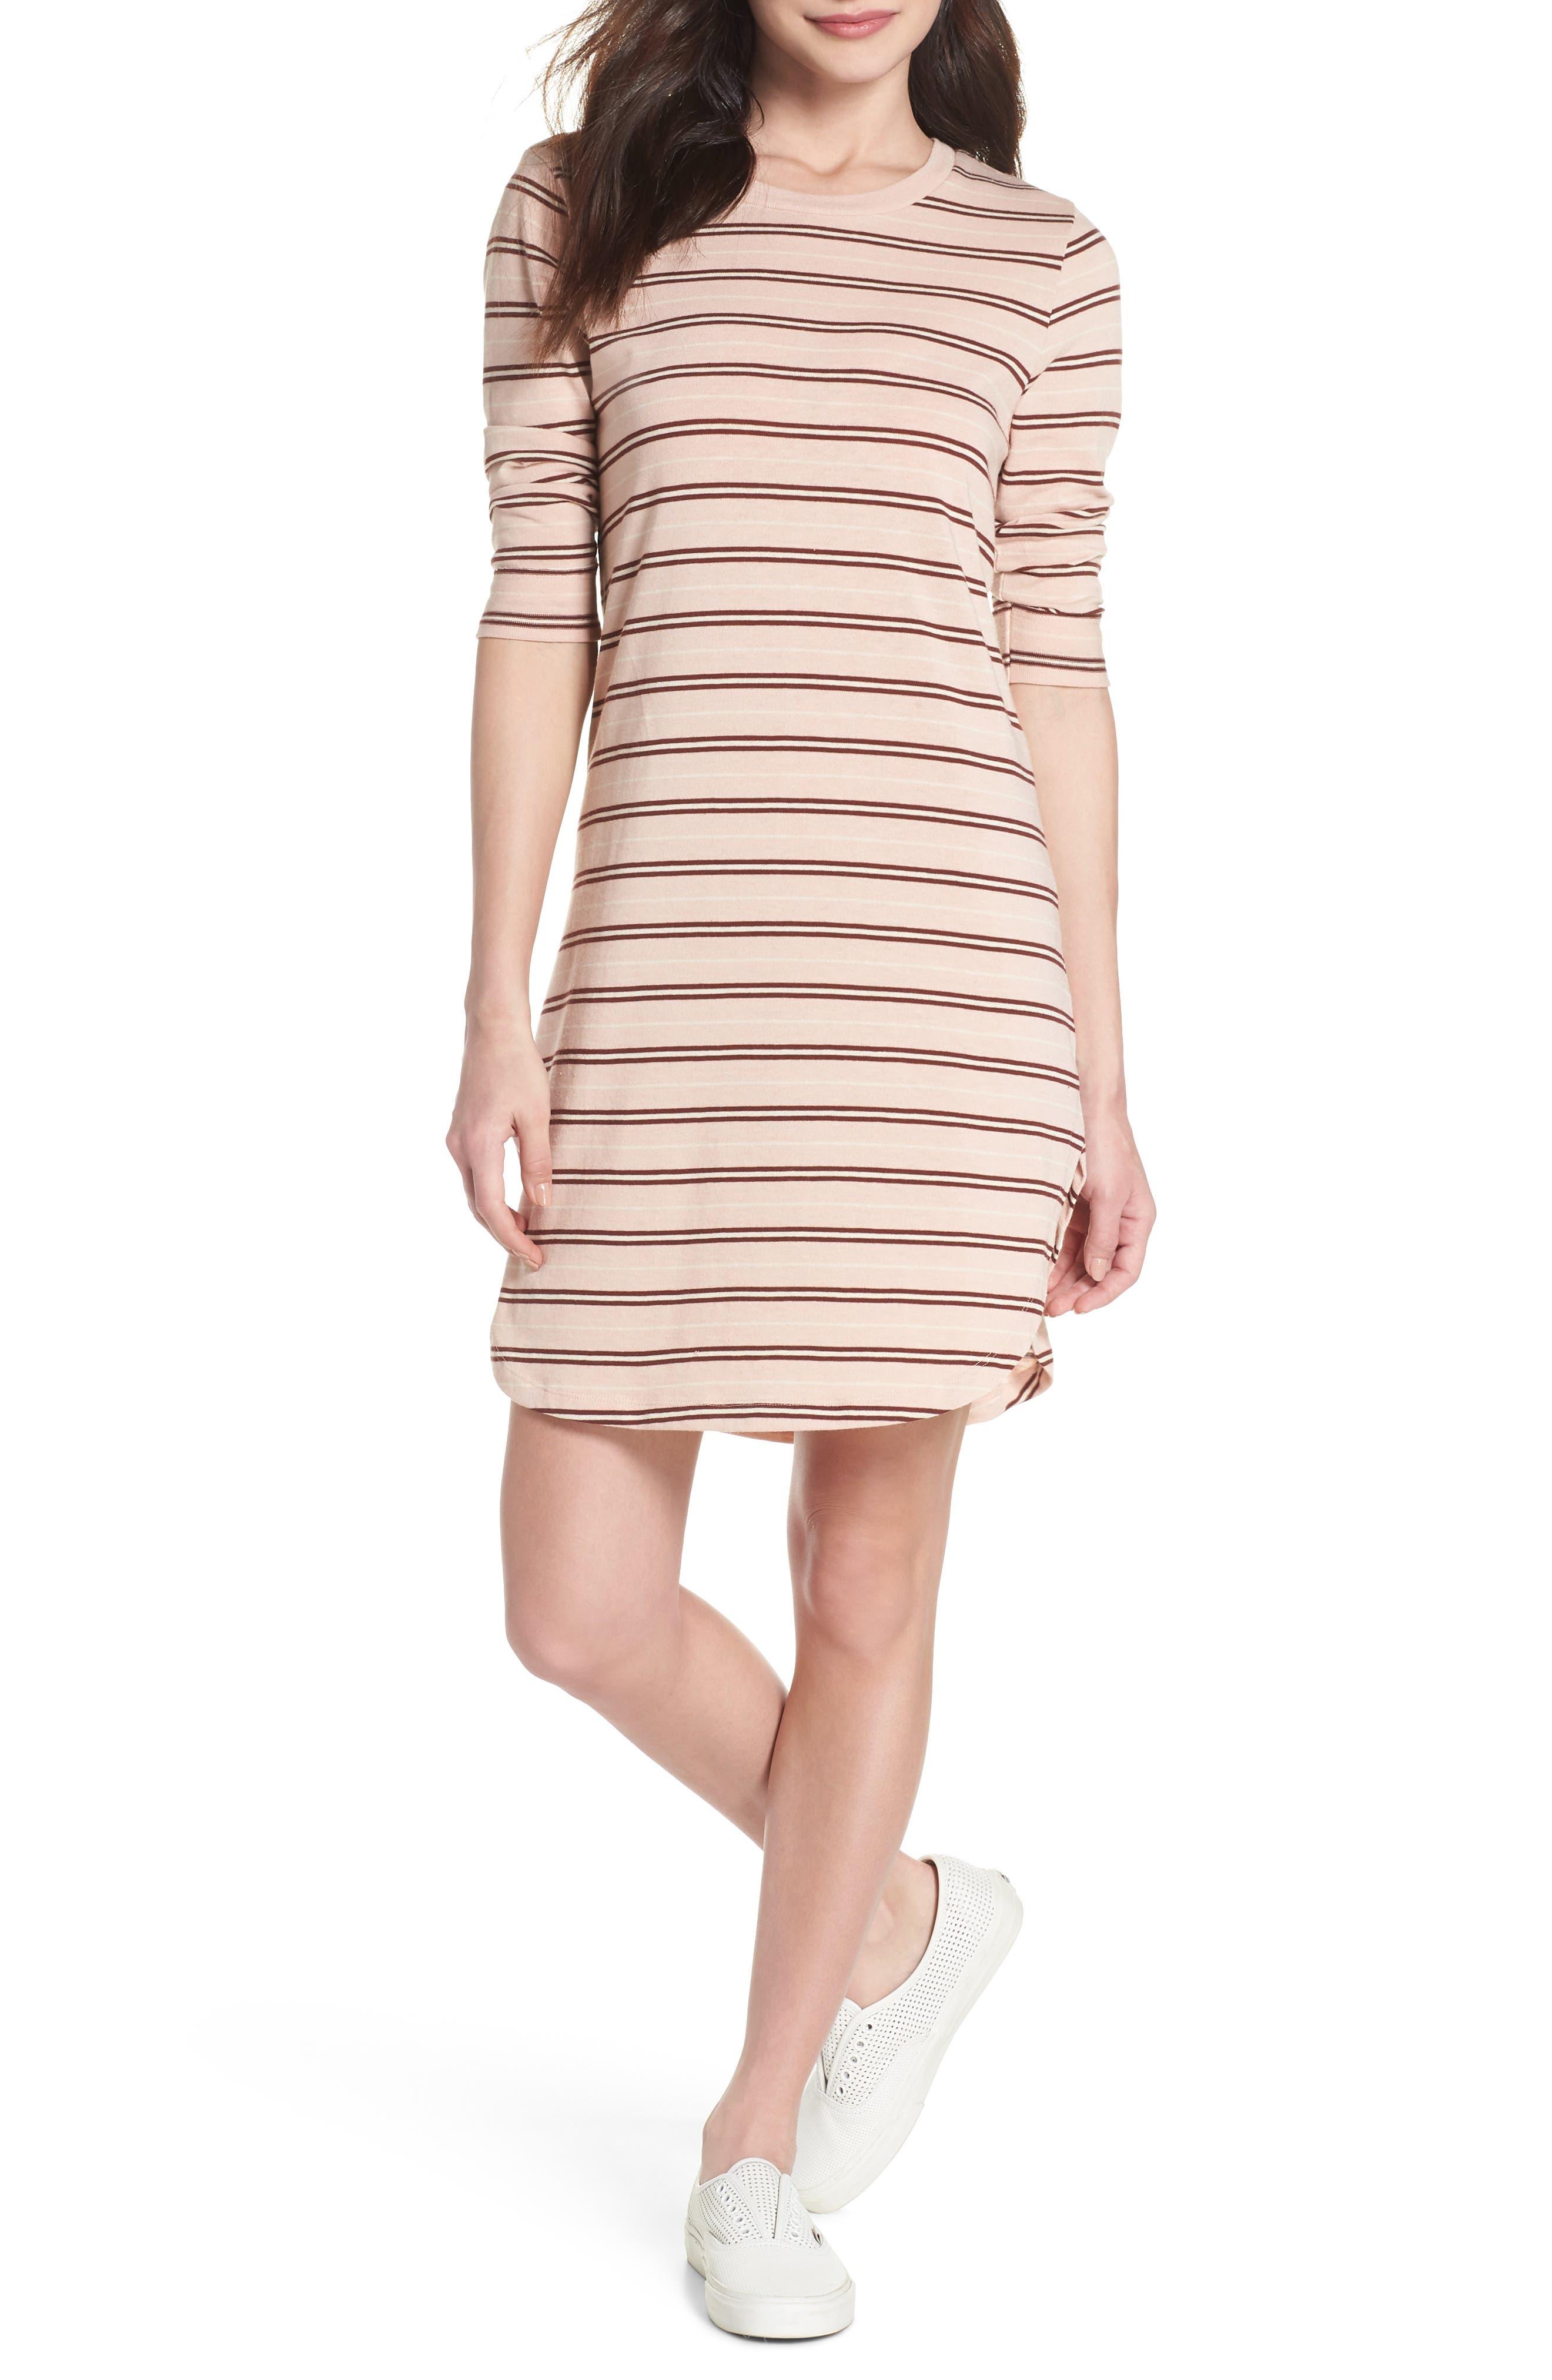 Saul Tunic Dress,                         Main,                         color, Blush 90S Stripe